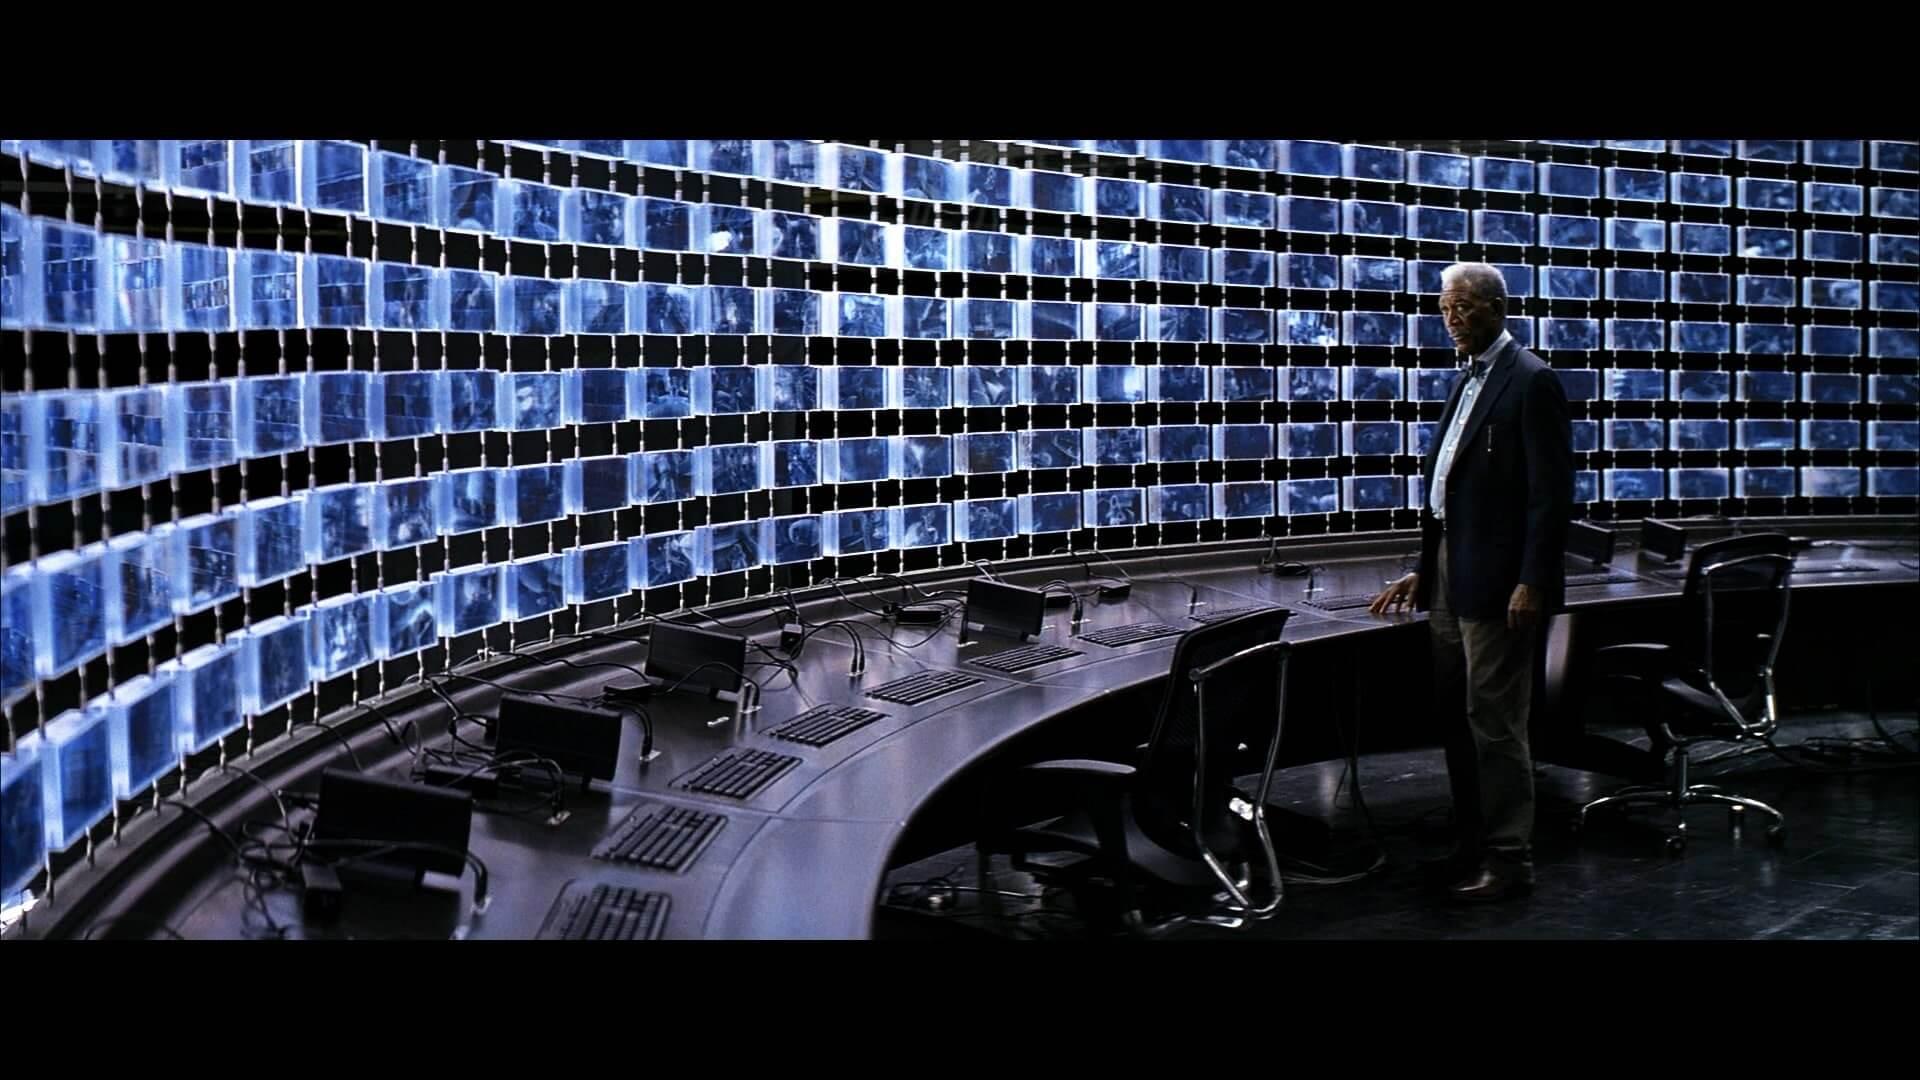 Morgan Freeman multiple screens and cameras